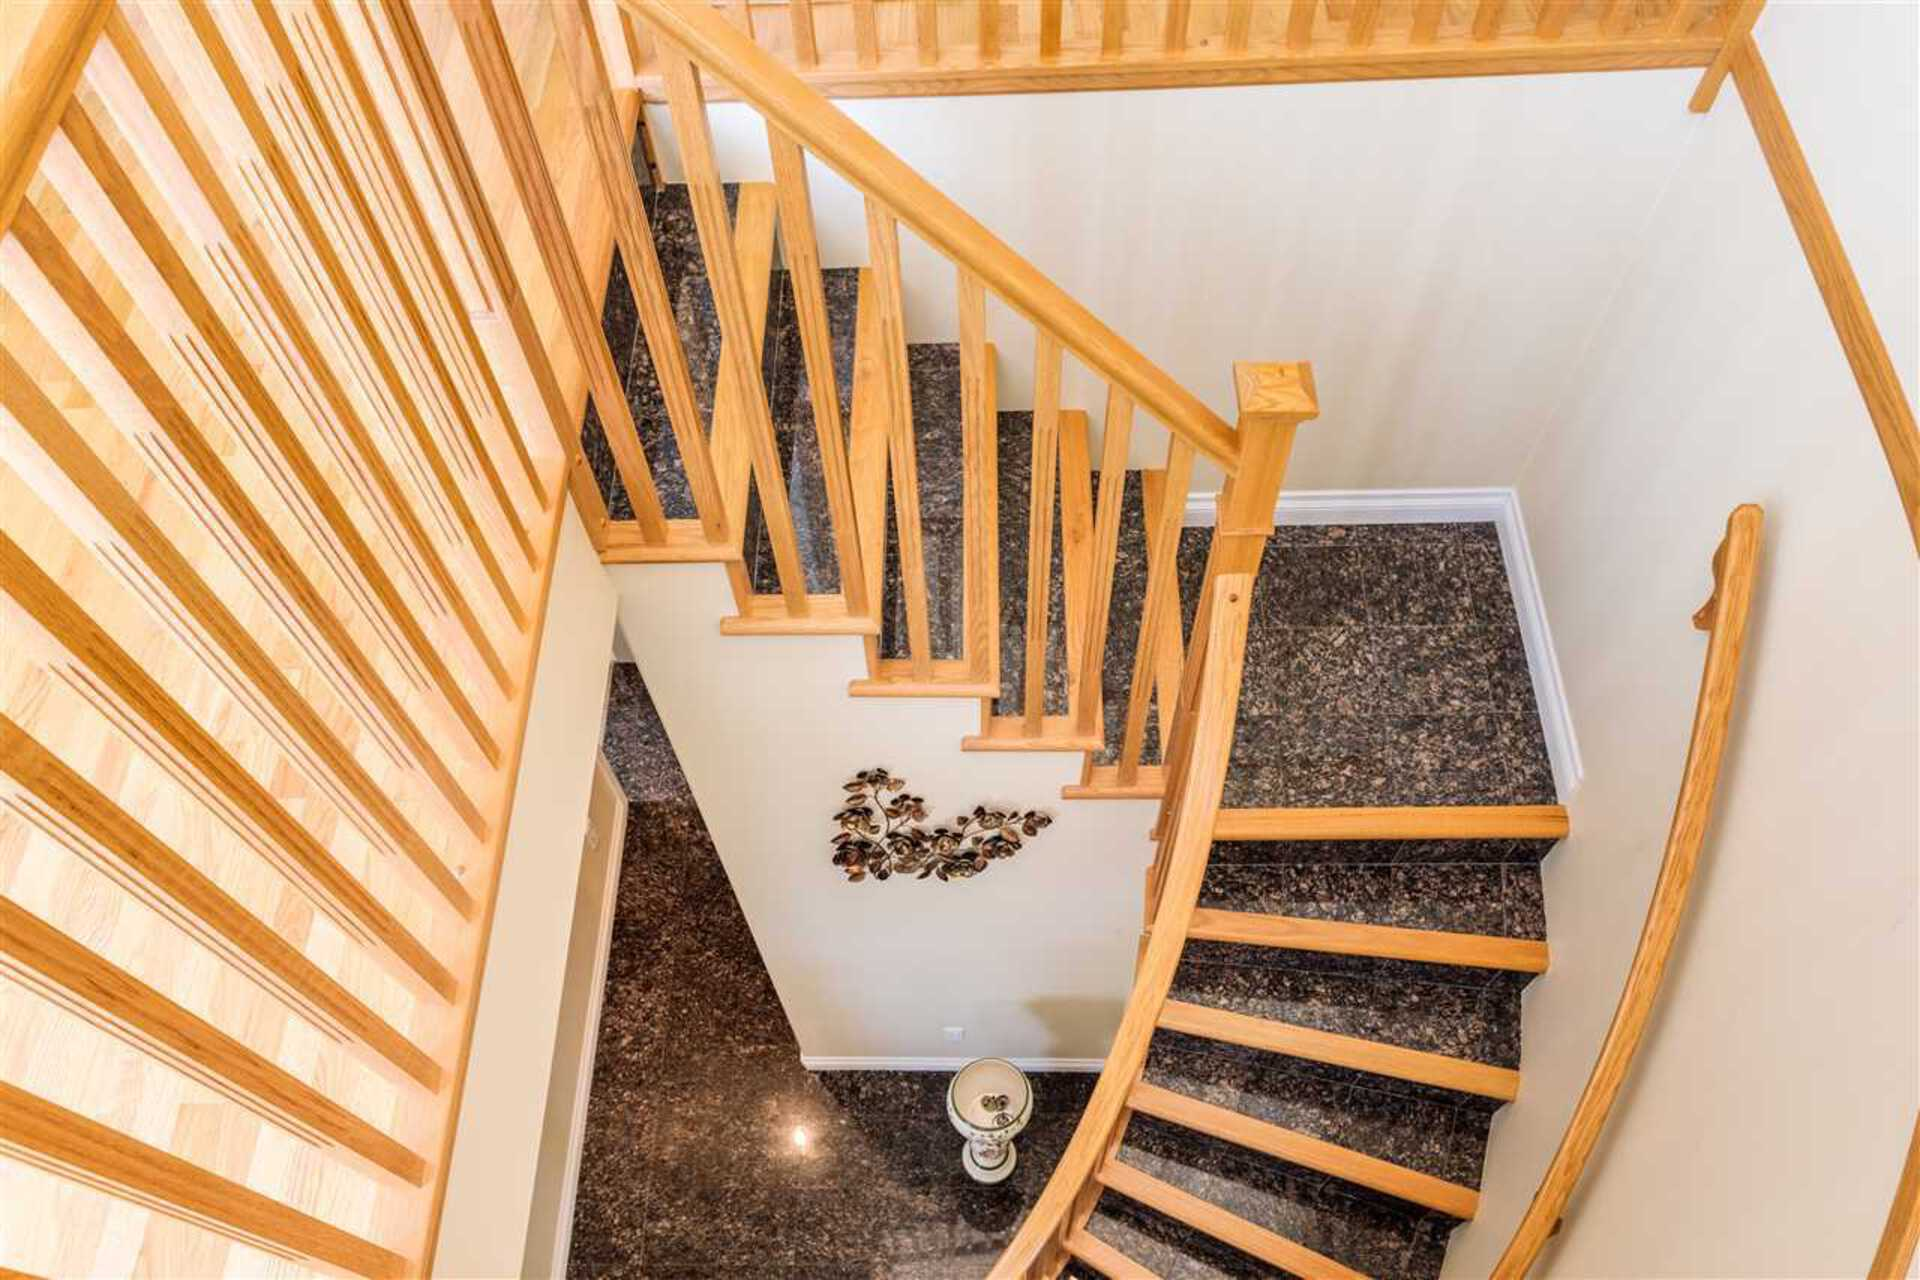 4015-frances-street-willingdon-heights-burnaby-north-13 at 4015 Frances Street, Willingdon Heights, Burnaby North